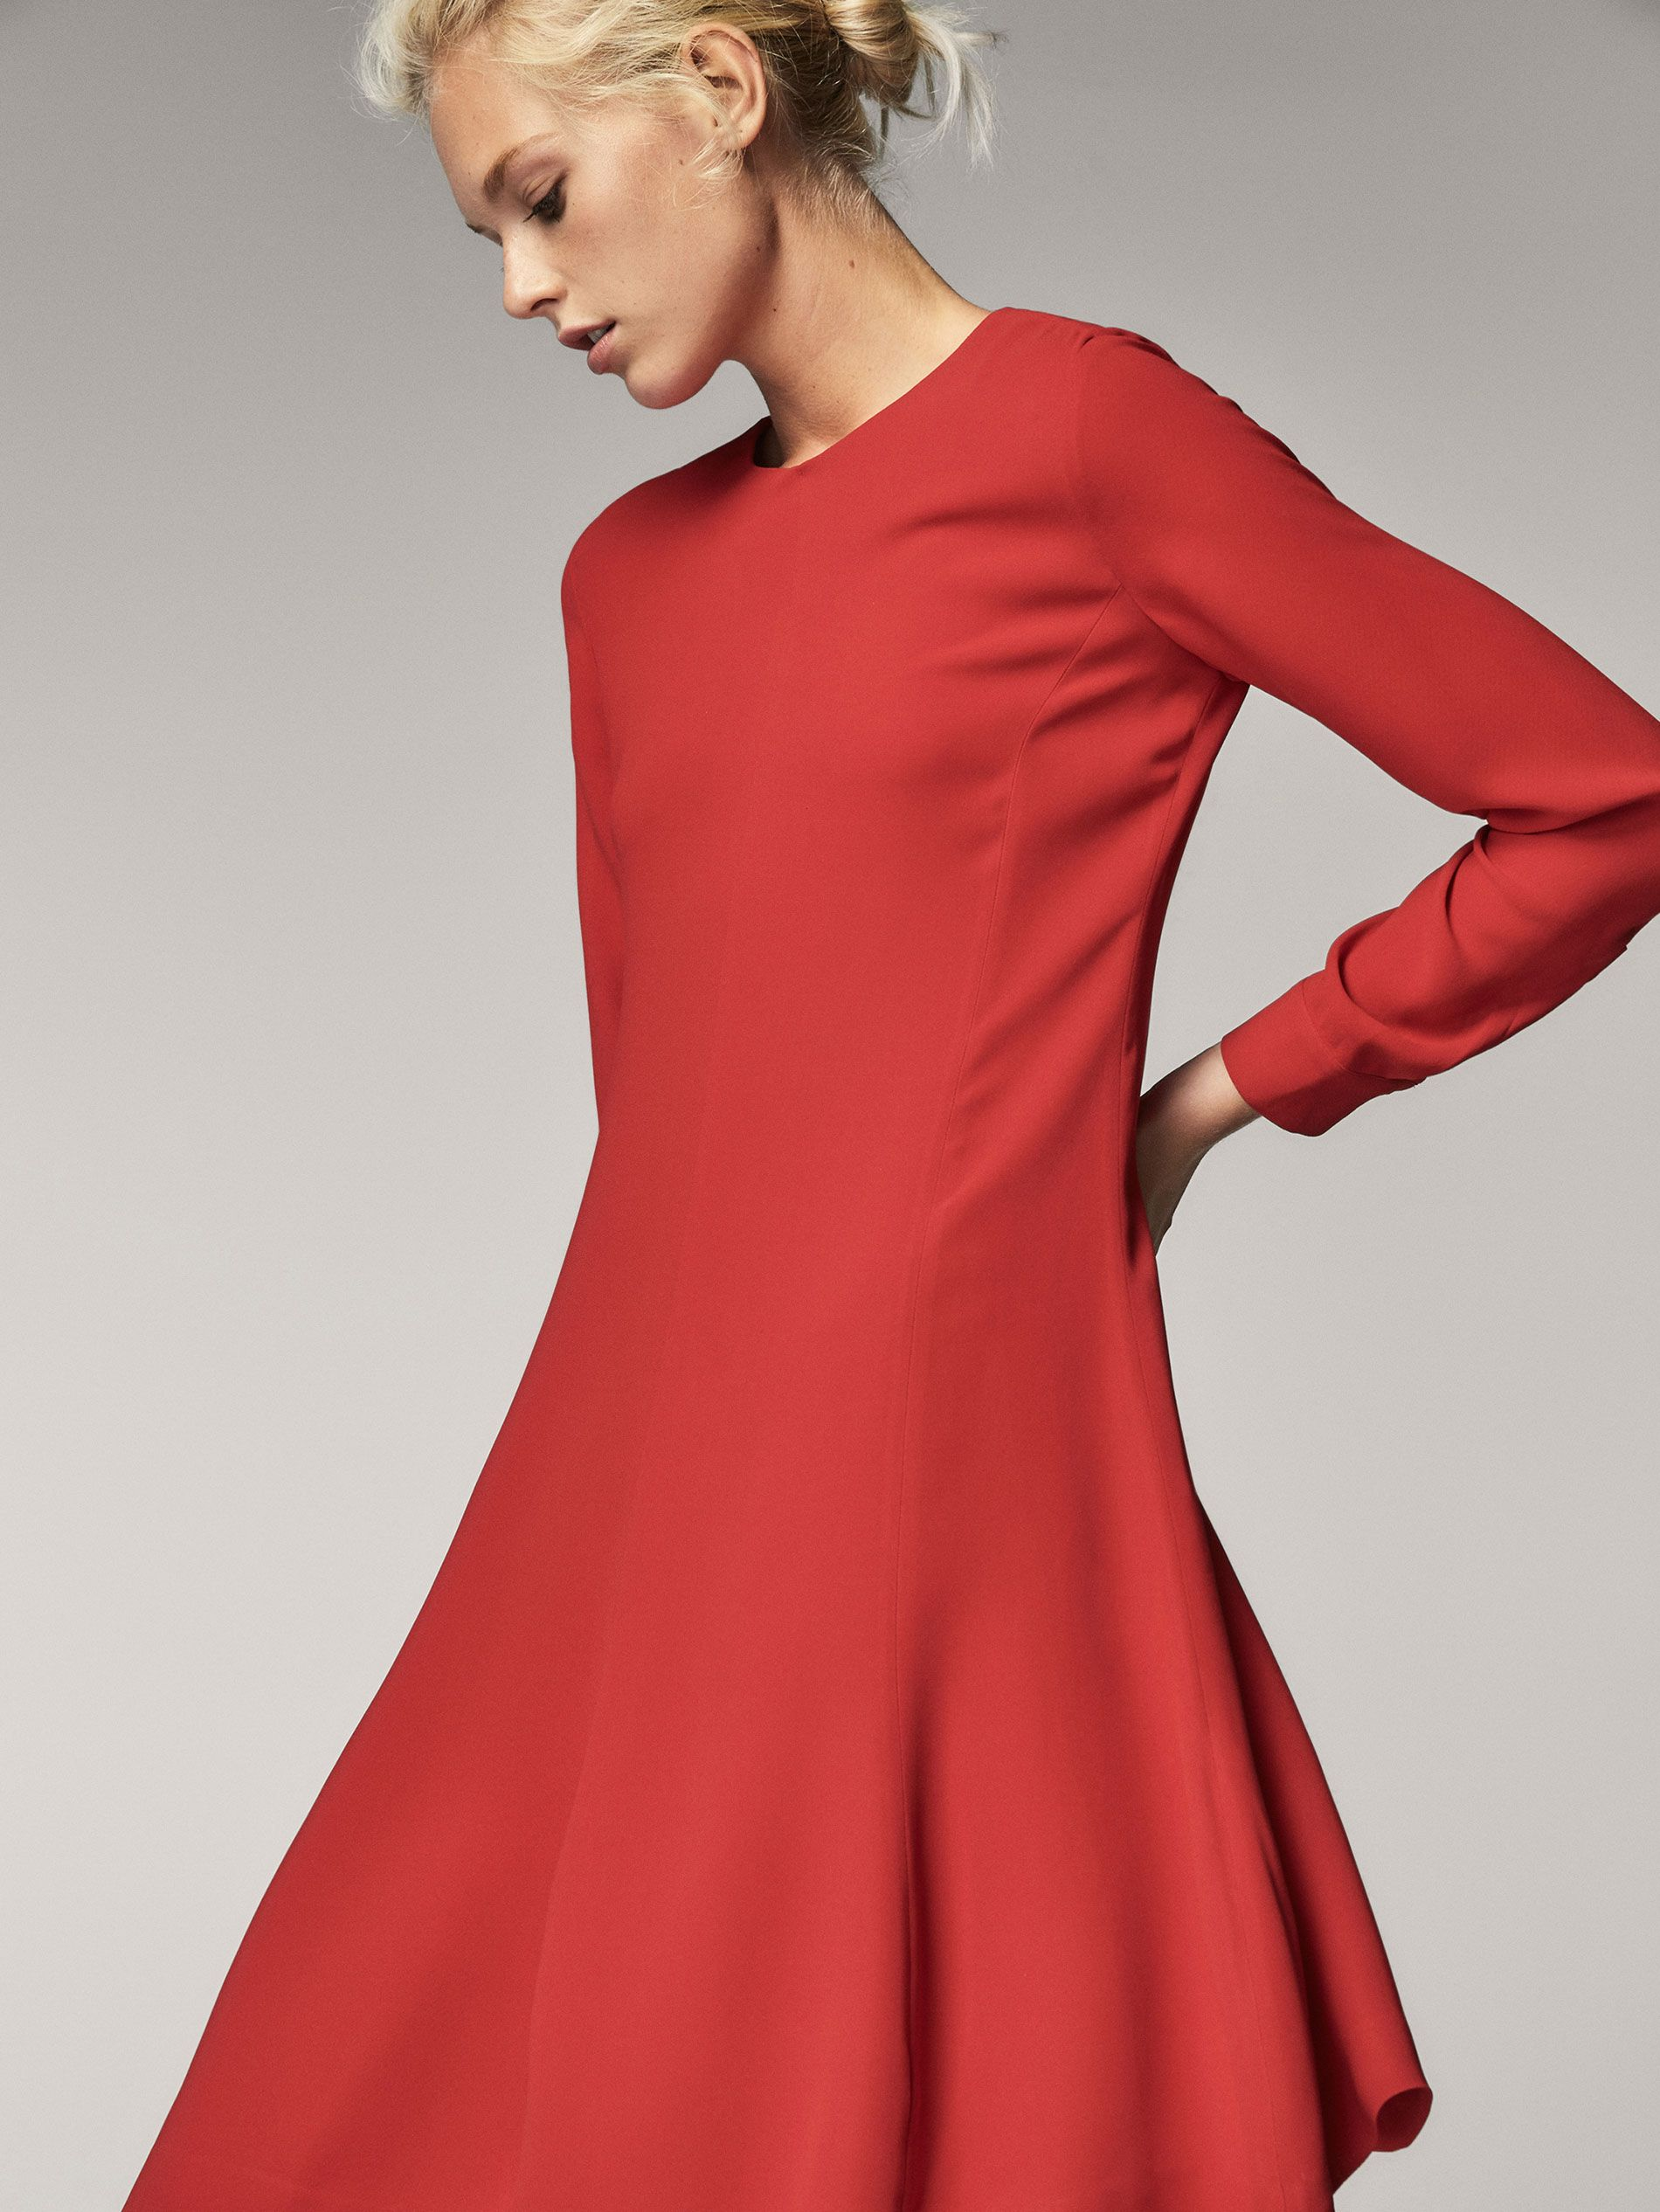 robe rouge vas e pour femmes robes de massimo dutti. Black Bedroom Furniture Sets. Home Design Ideas